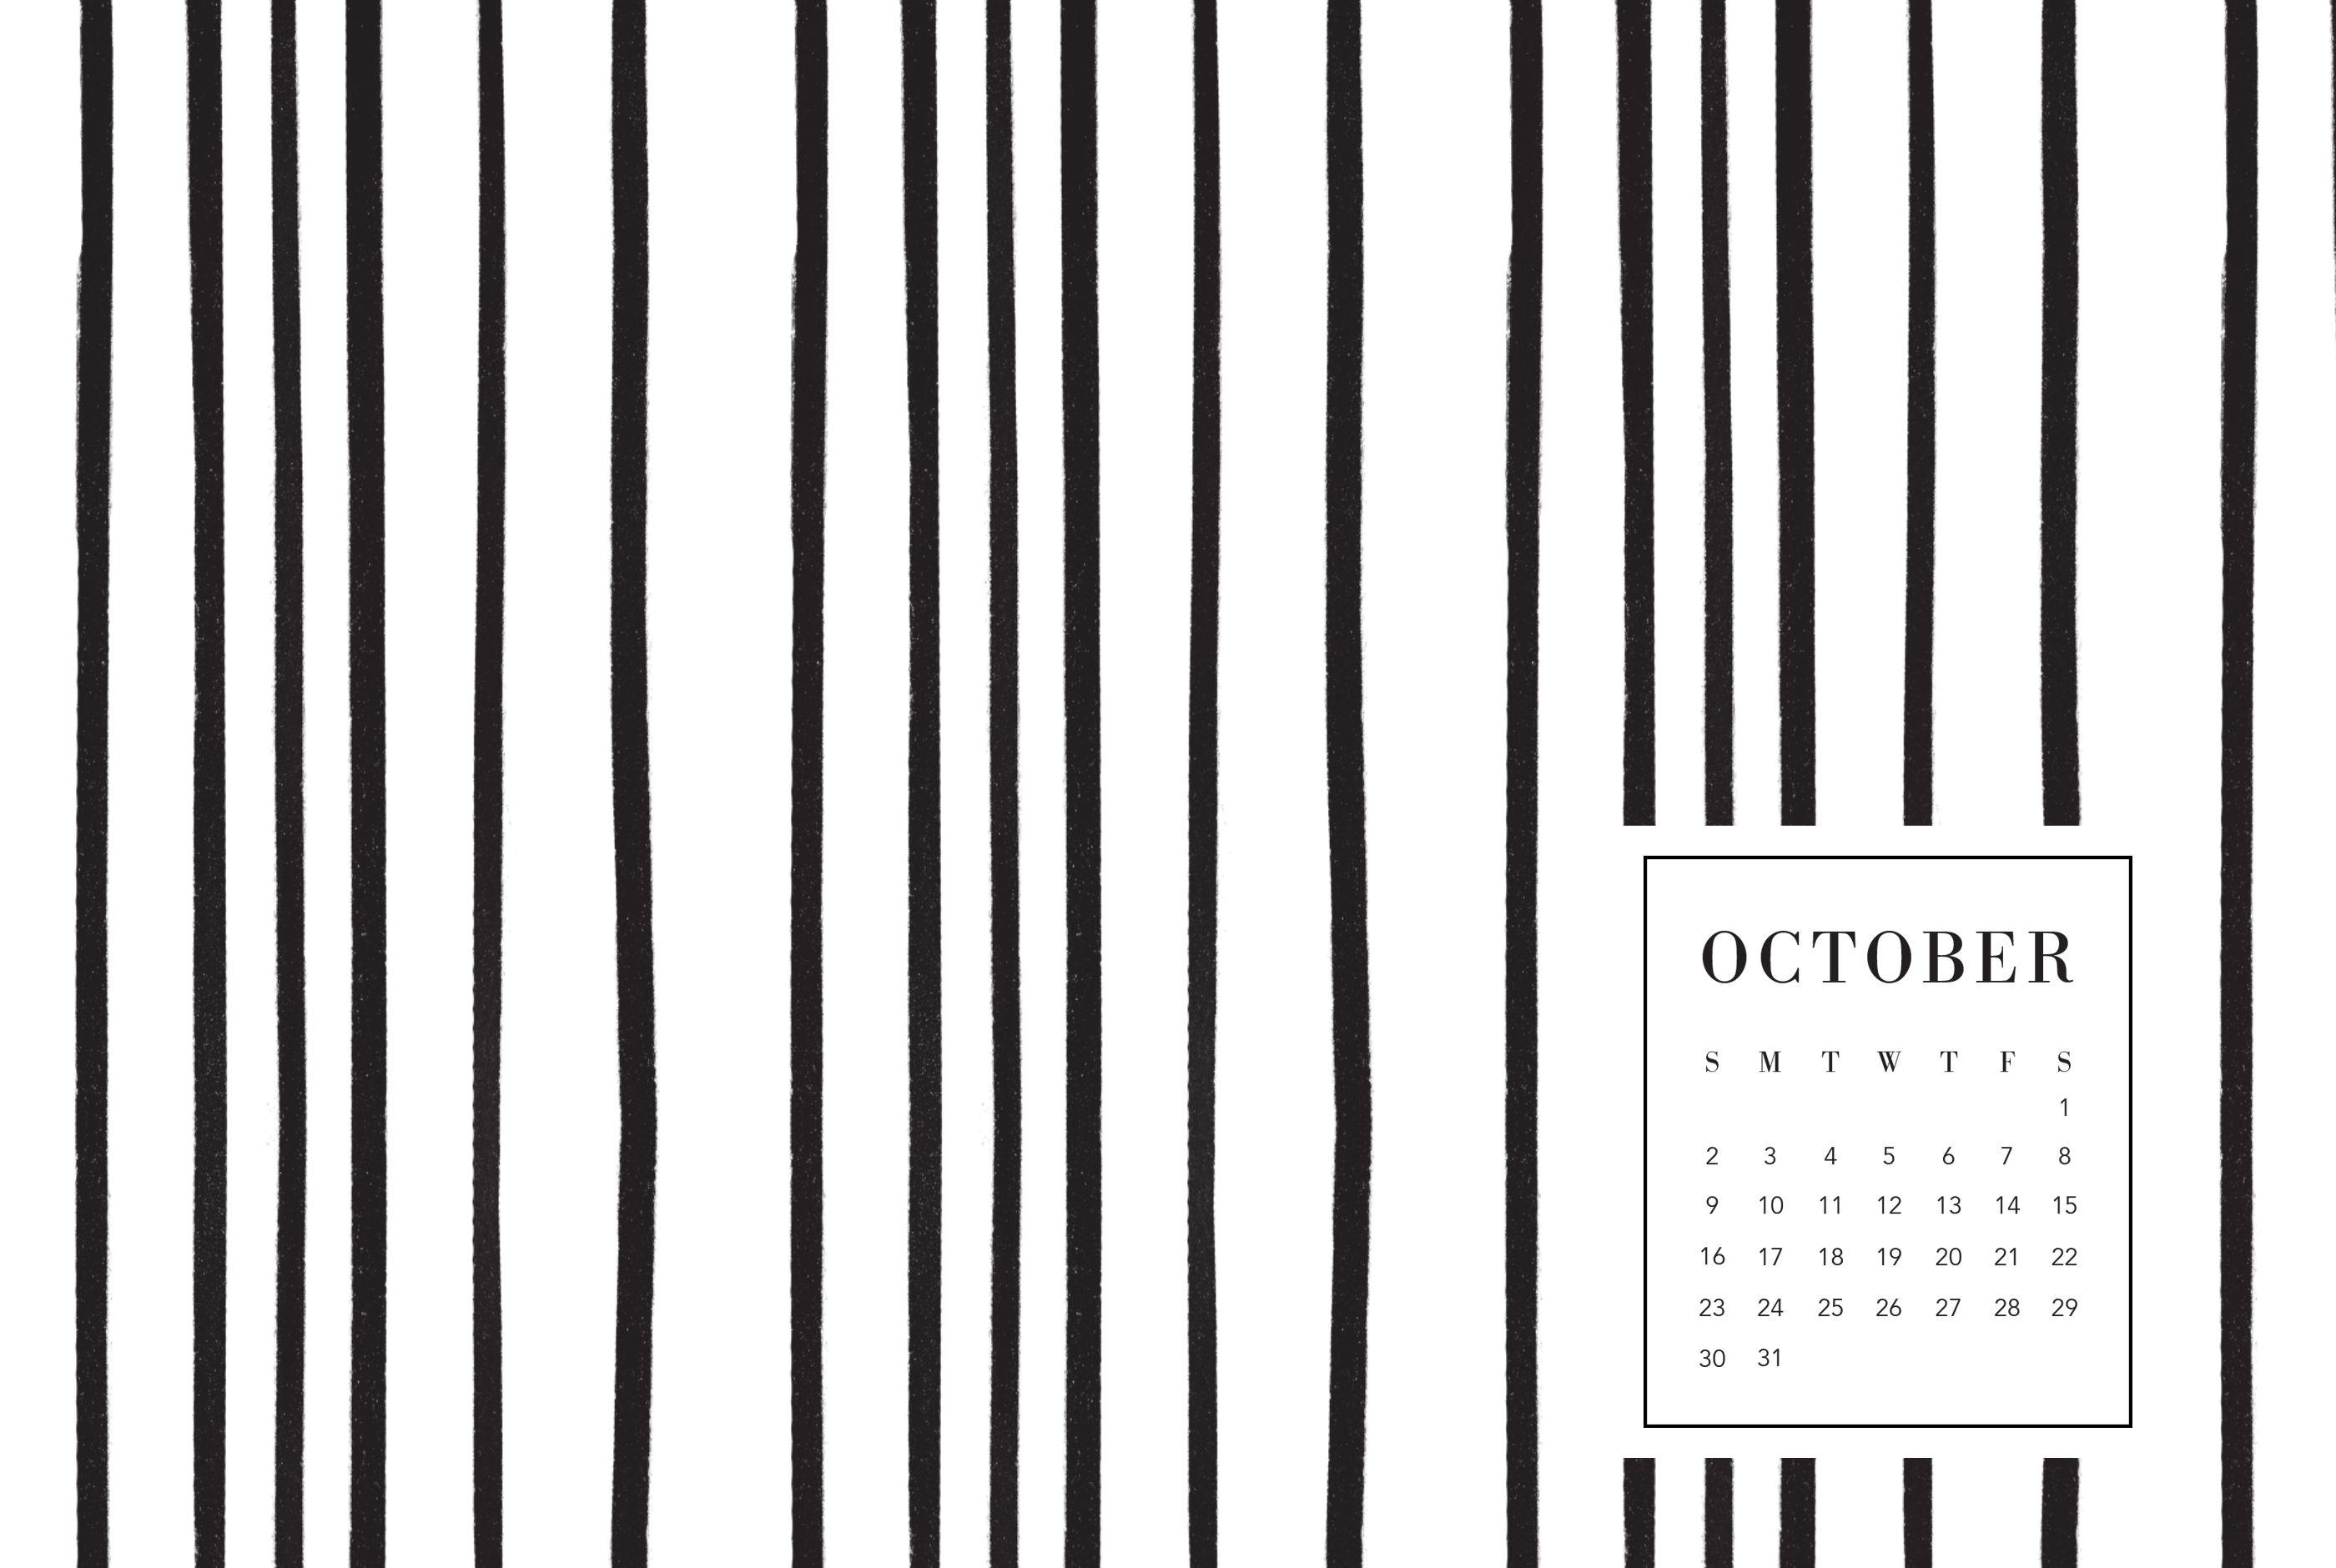 Download Wallpaper Marble Calendar - d699cc2302d6e3453c5b7b1a5da55fdc  Perfect Image Reference_261397.jpg